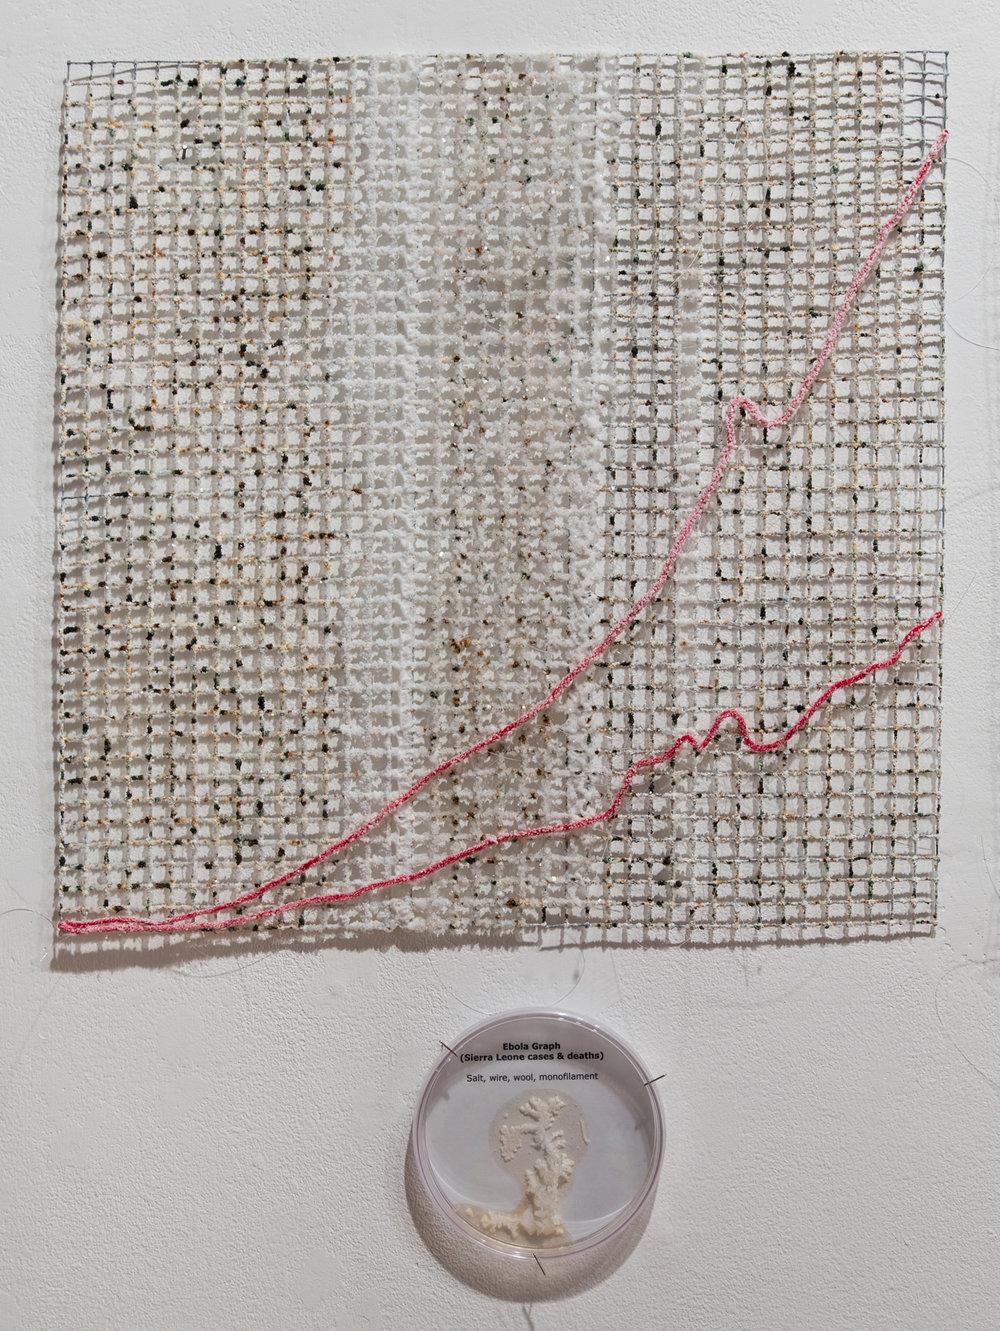 "Ebola Graph - Sierra Leone grown salt crystals, wool, wire, agar, halobacteria, agar, petri dish 20"" x 20"" 2015"